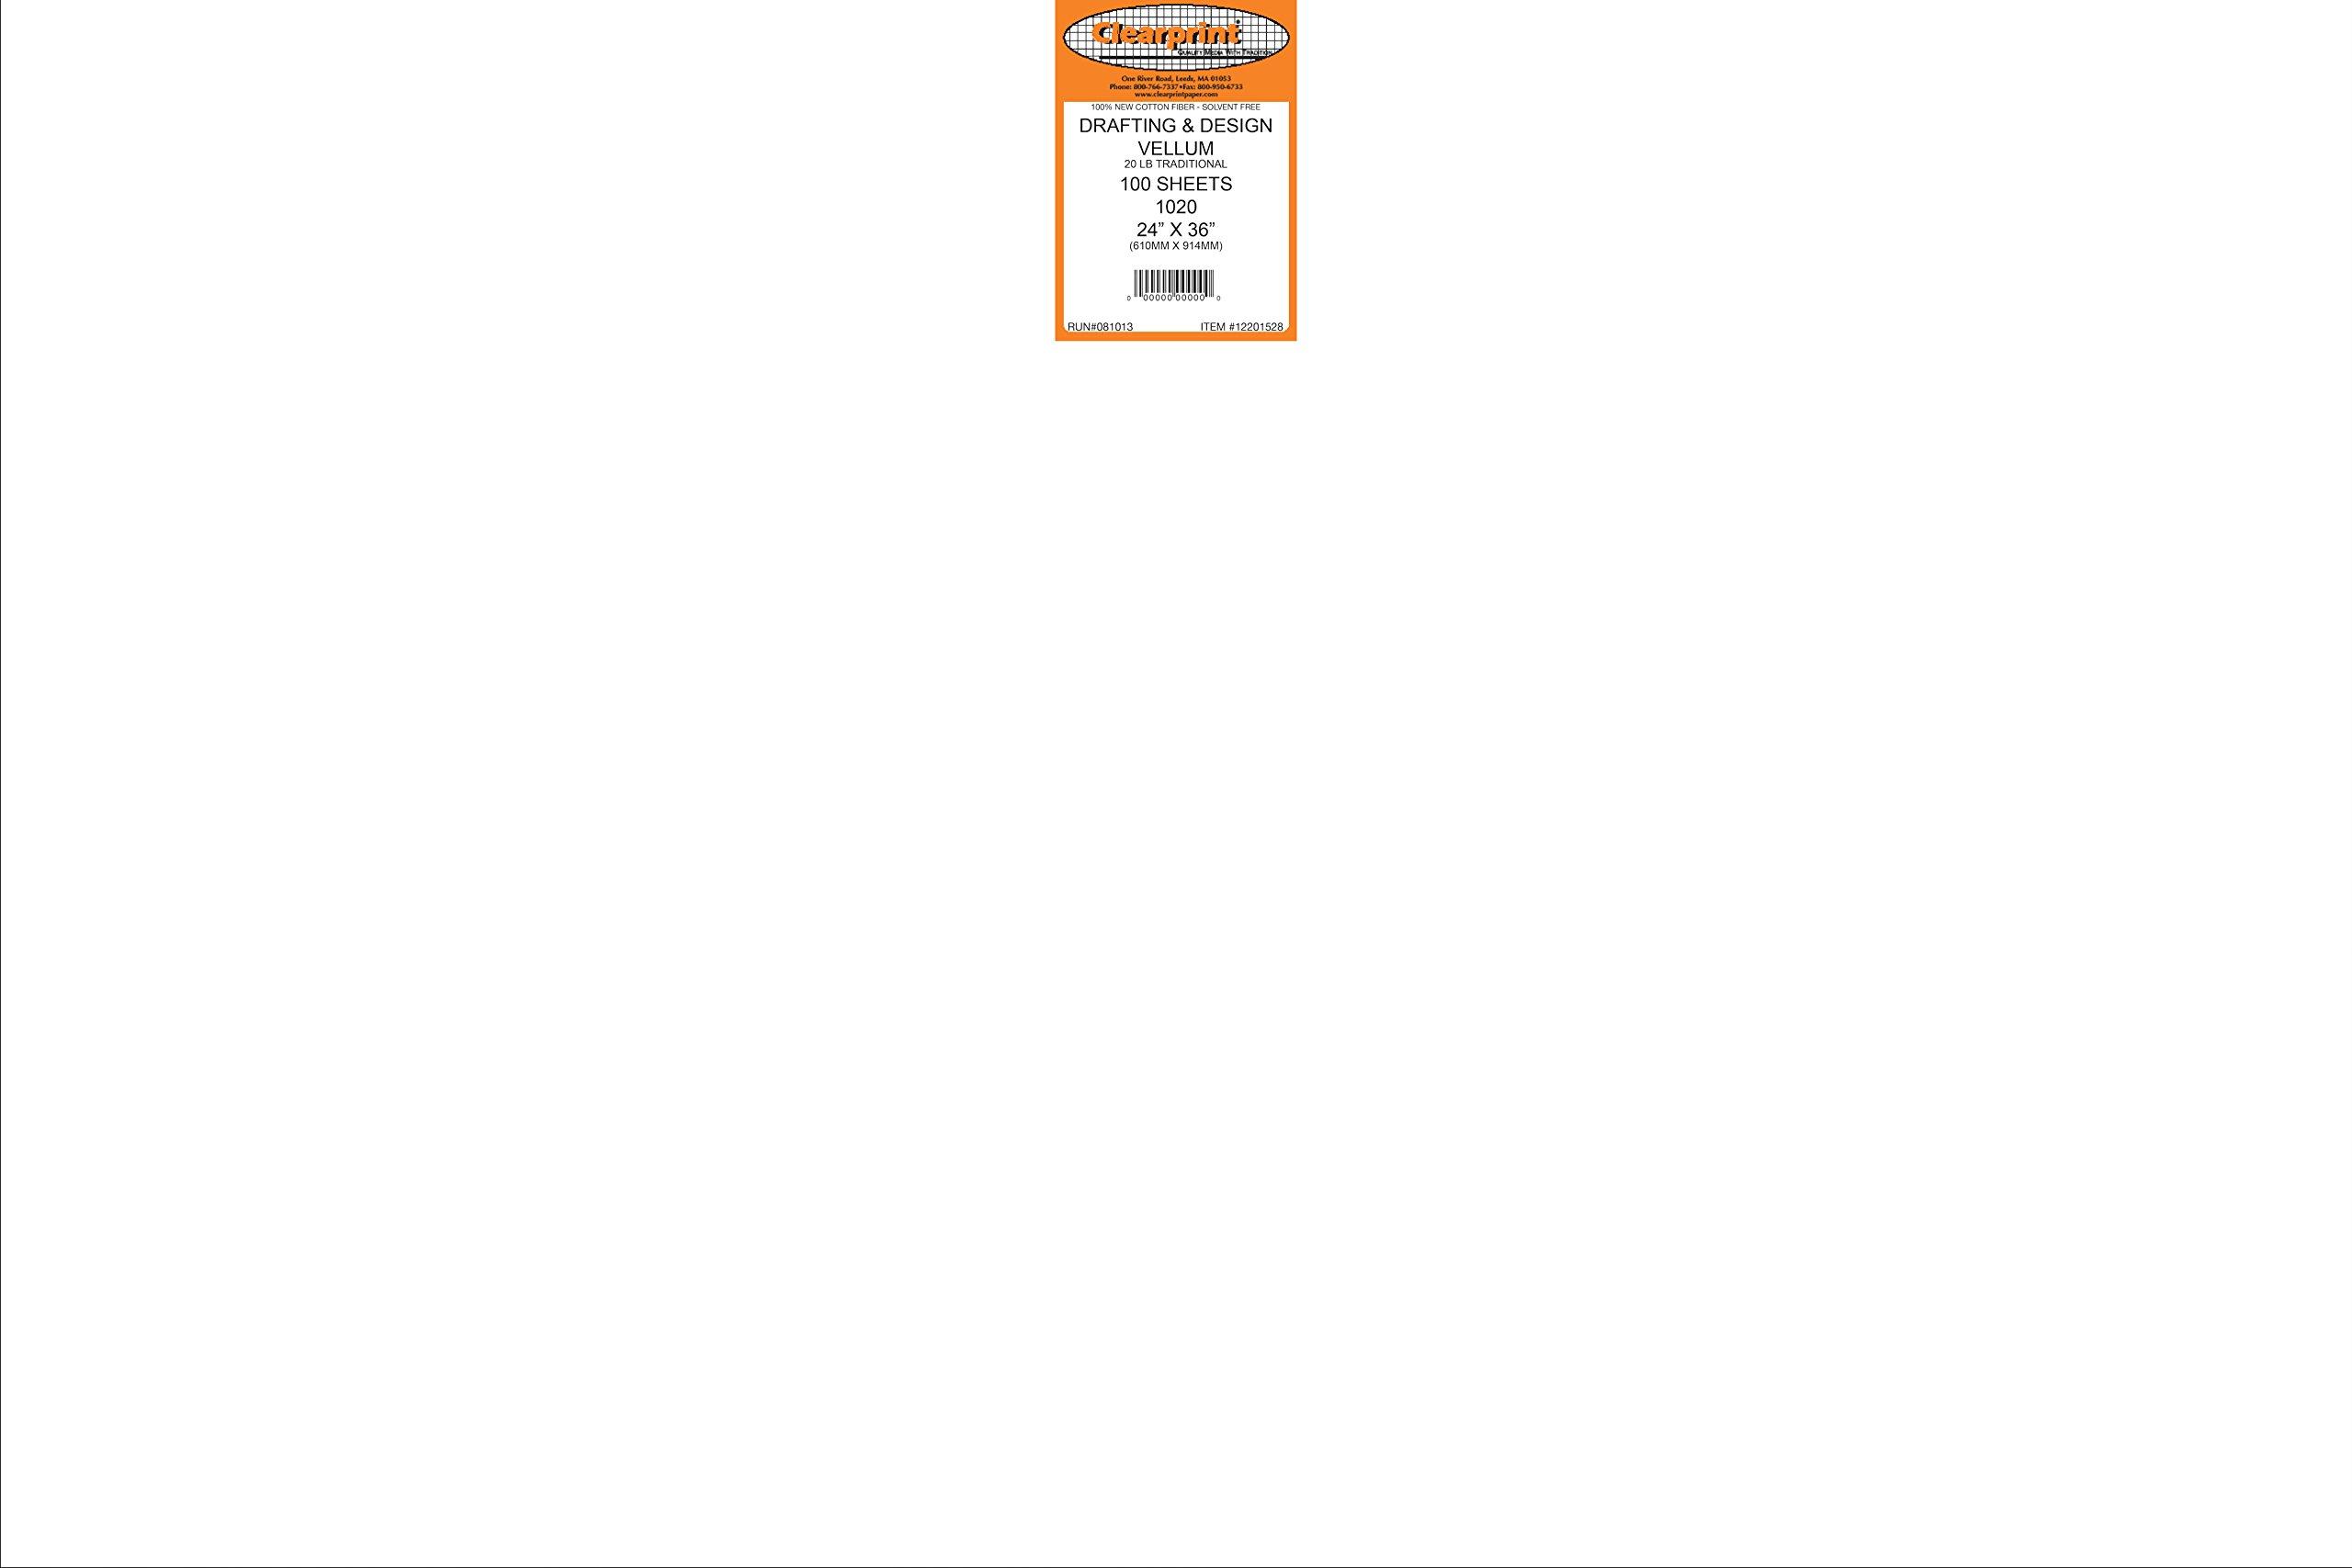 Clearprint 1020H Design Vellum Sheets, 20 lb., 100% Cotton, 24 x 36 Inches, 100 Sheets Per Pack, Translucent White, 1 Each (12201528)